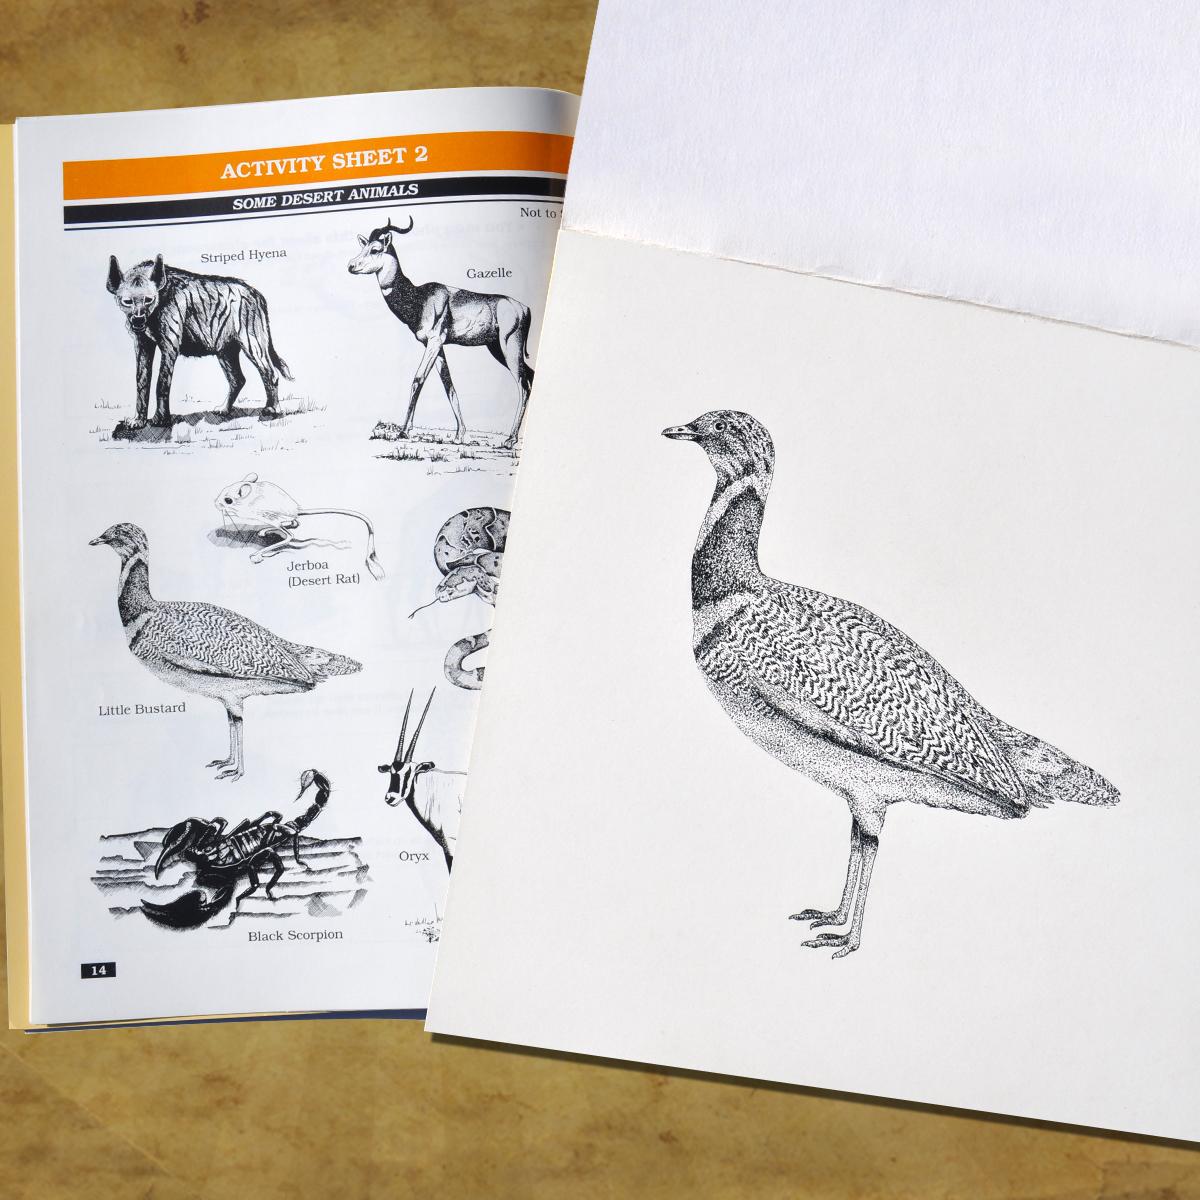 A pen illustration by Intrepid Design Associates